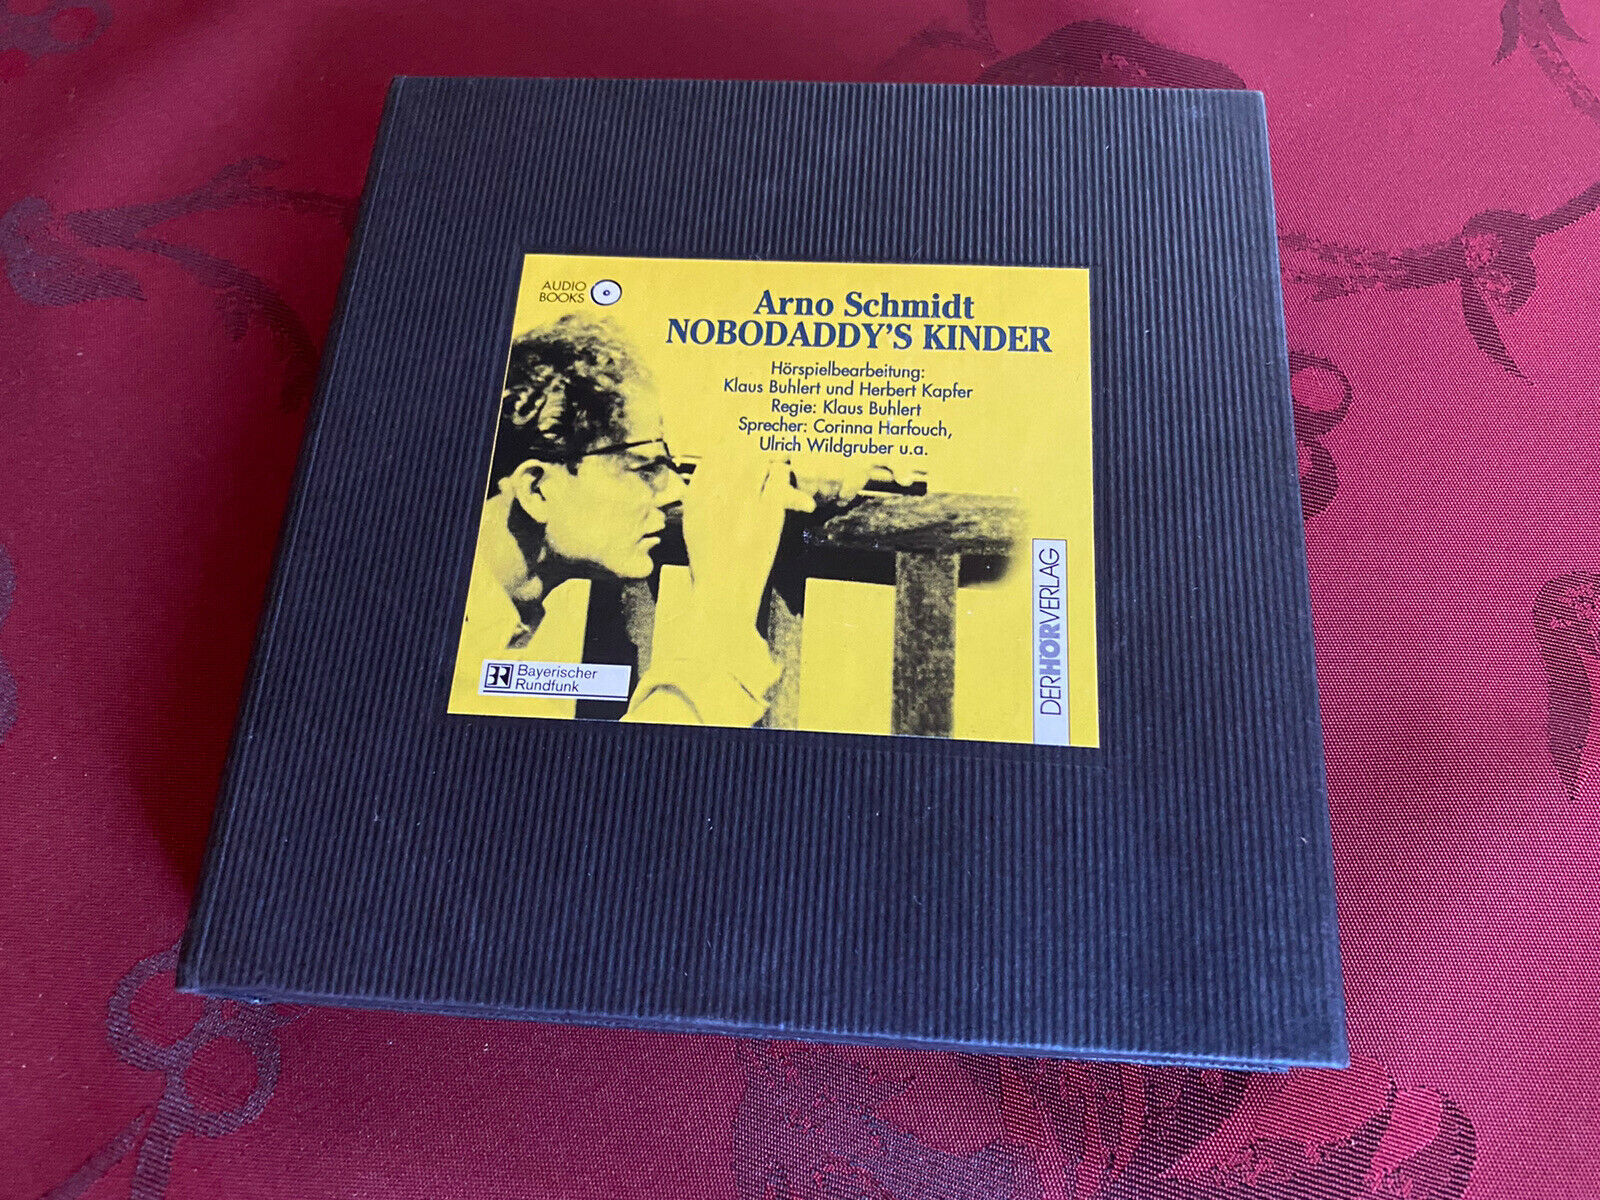 Arno Schmidt * Nobodaddys Kinder * Luxusausgabe Hörspiele 4 CD* Hörverlag * rar - Arno Schmidt